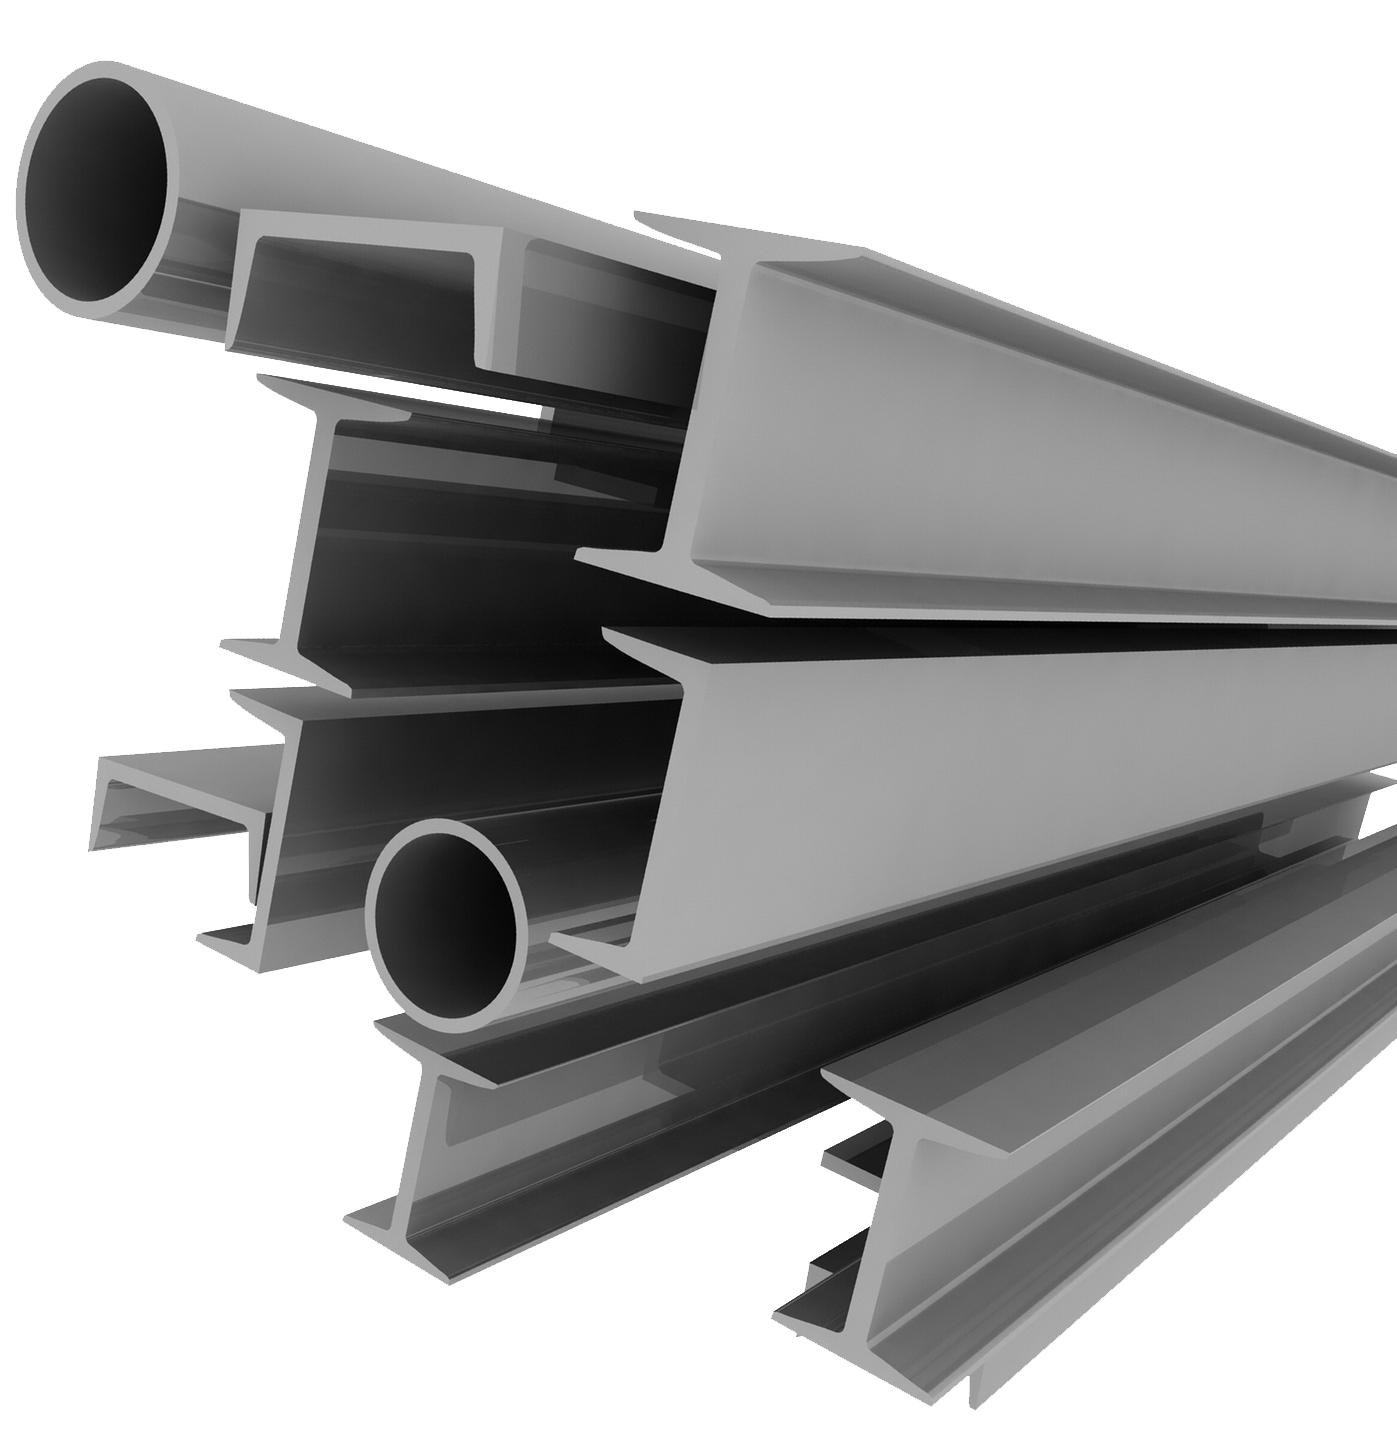 Steel Free PNG Image.